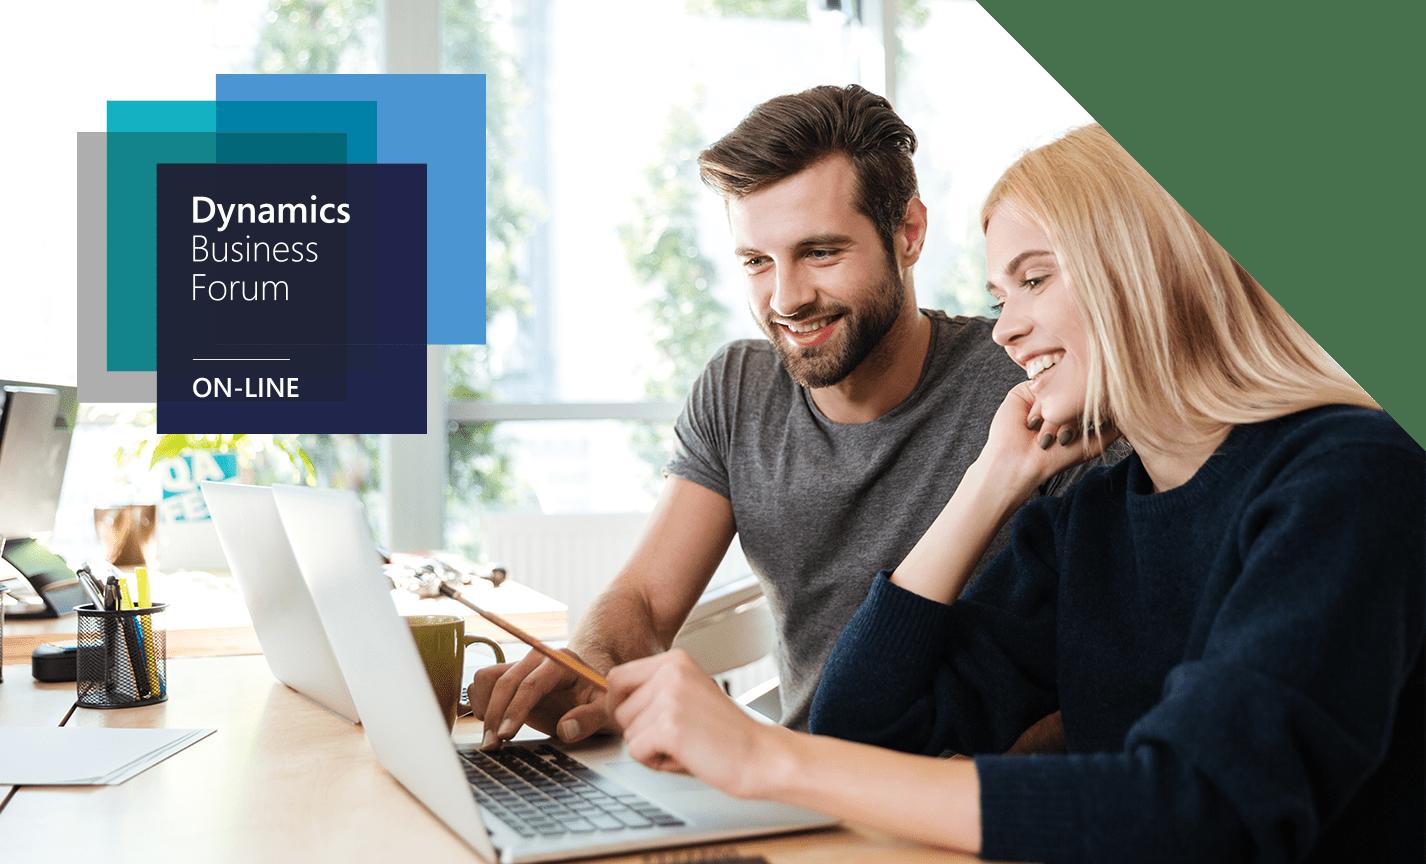 Dynamics Business Forum